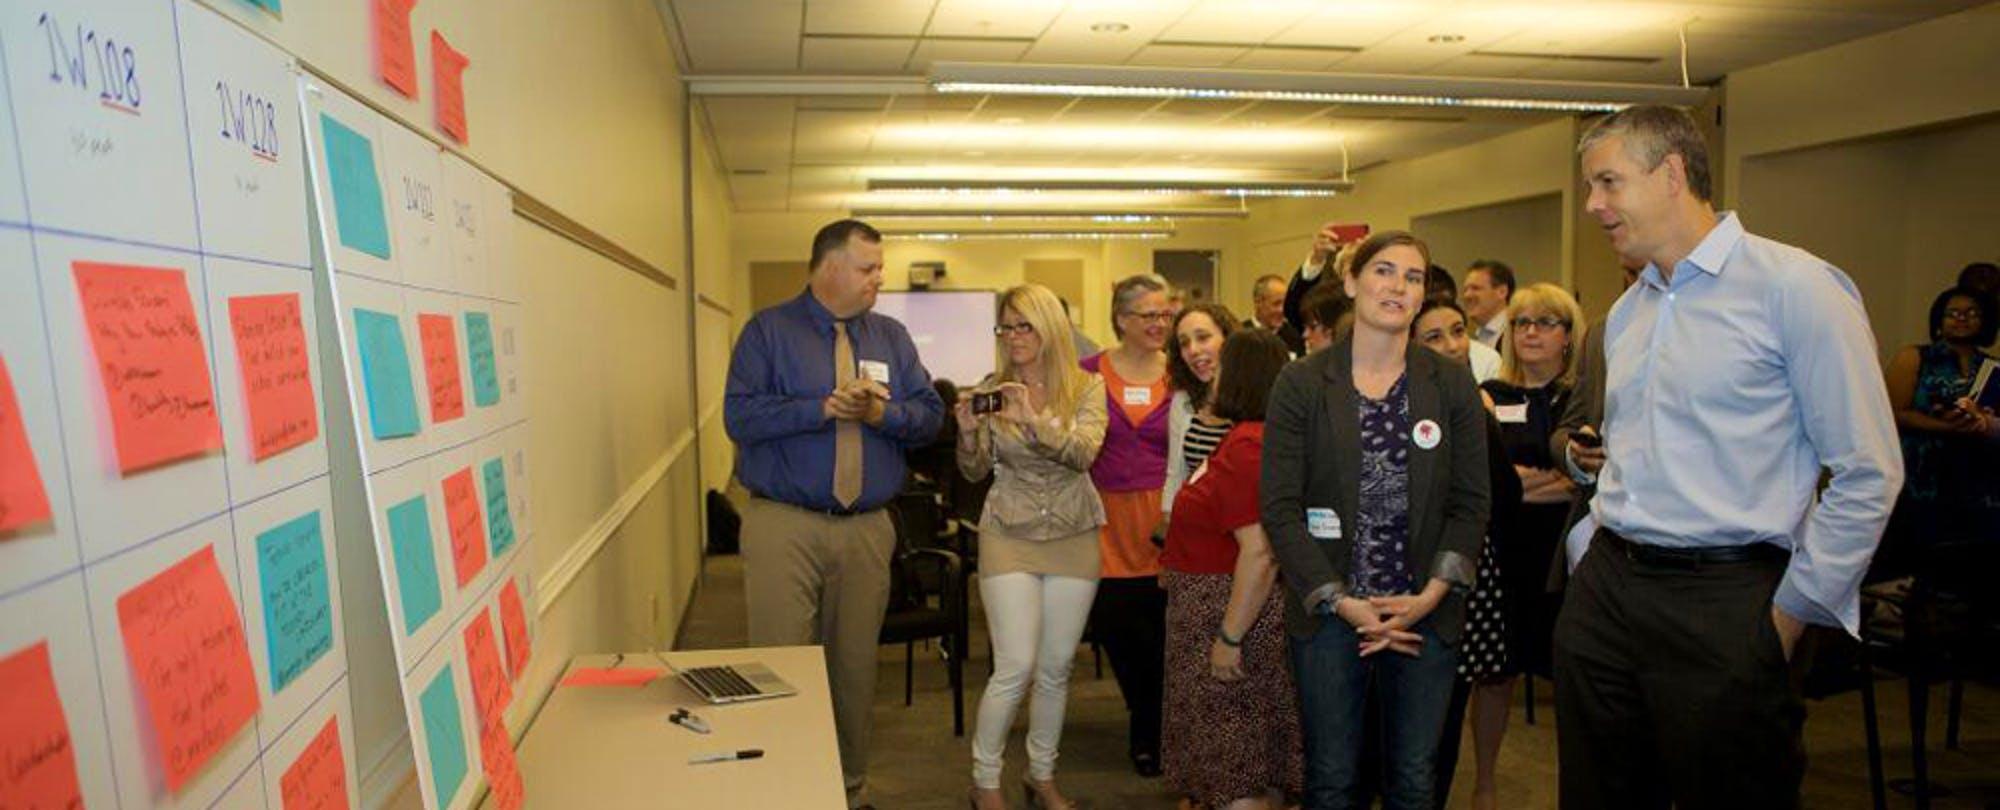 Arne Duncan Visits Edcamp at Department of Education HQ